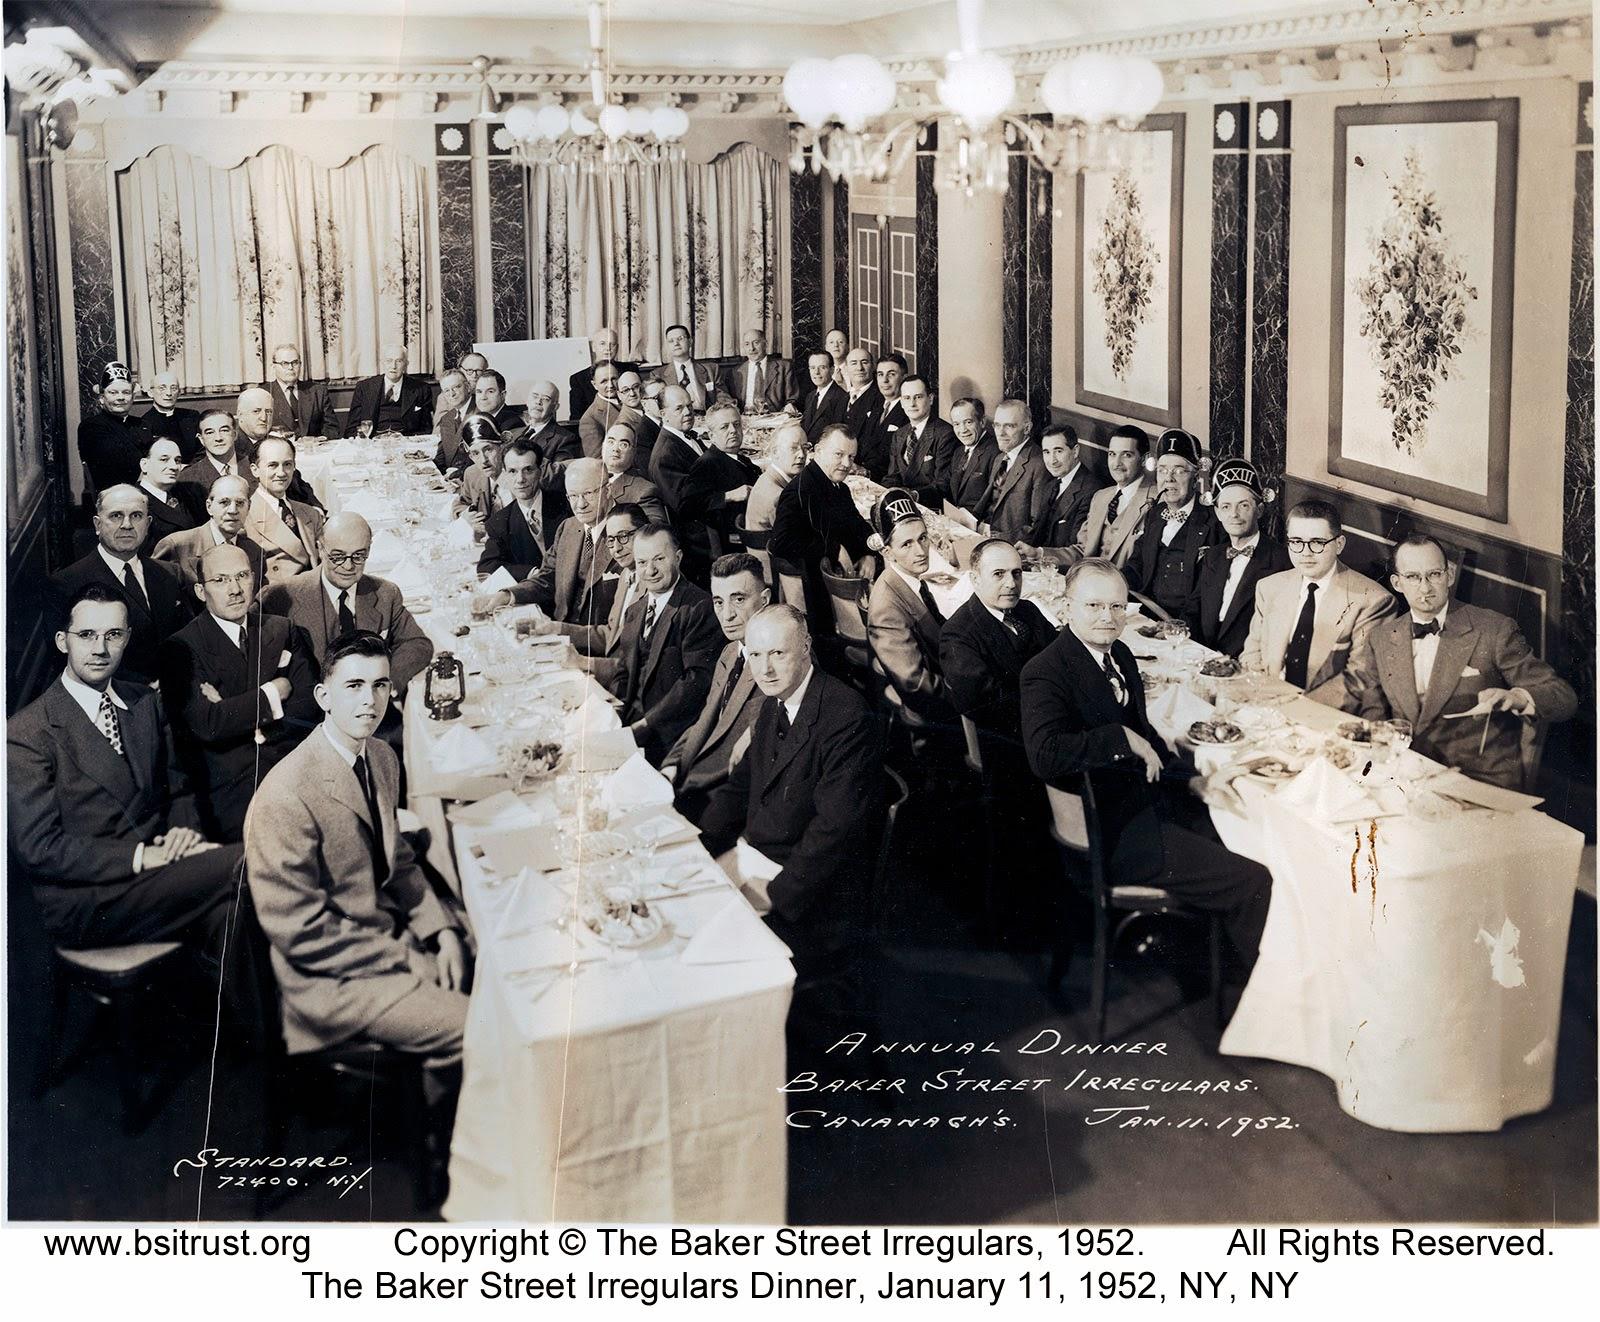 The 1952 BSI Dinner group photo